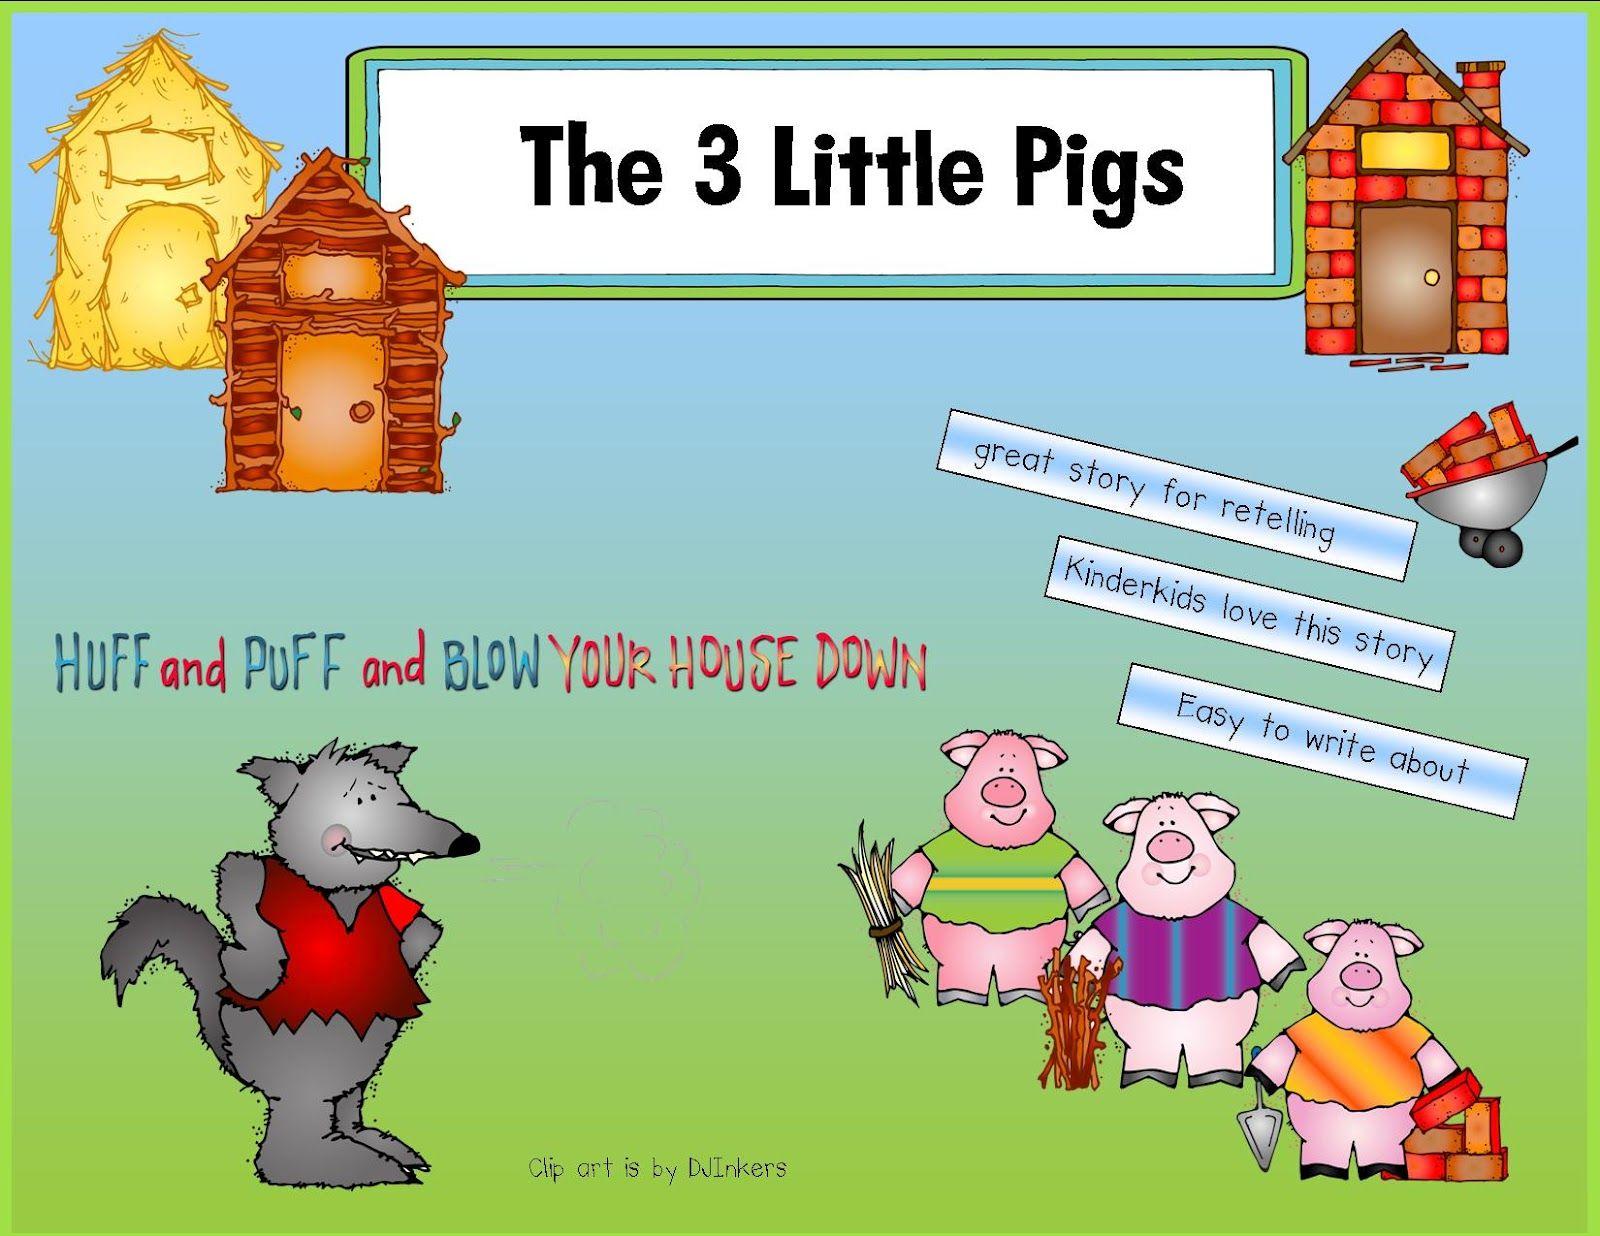 Kindergarten Crayons 3 Little Pigs Unit Ideas